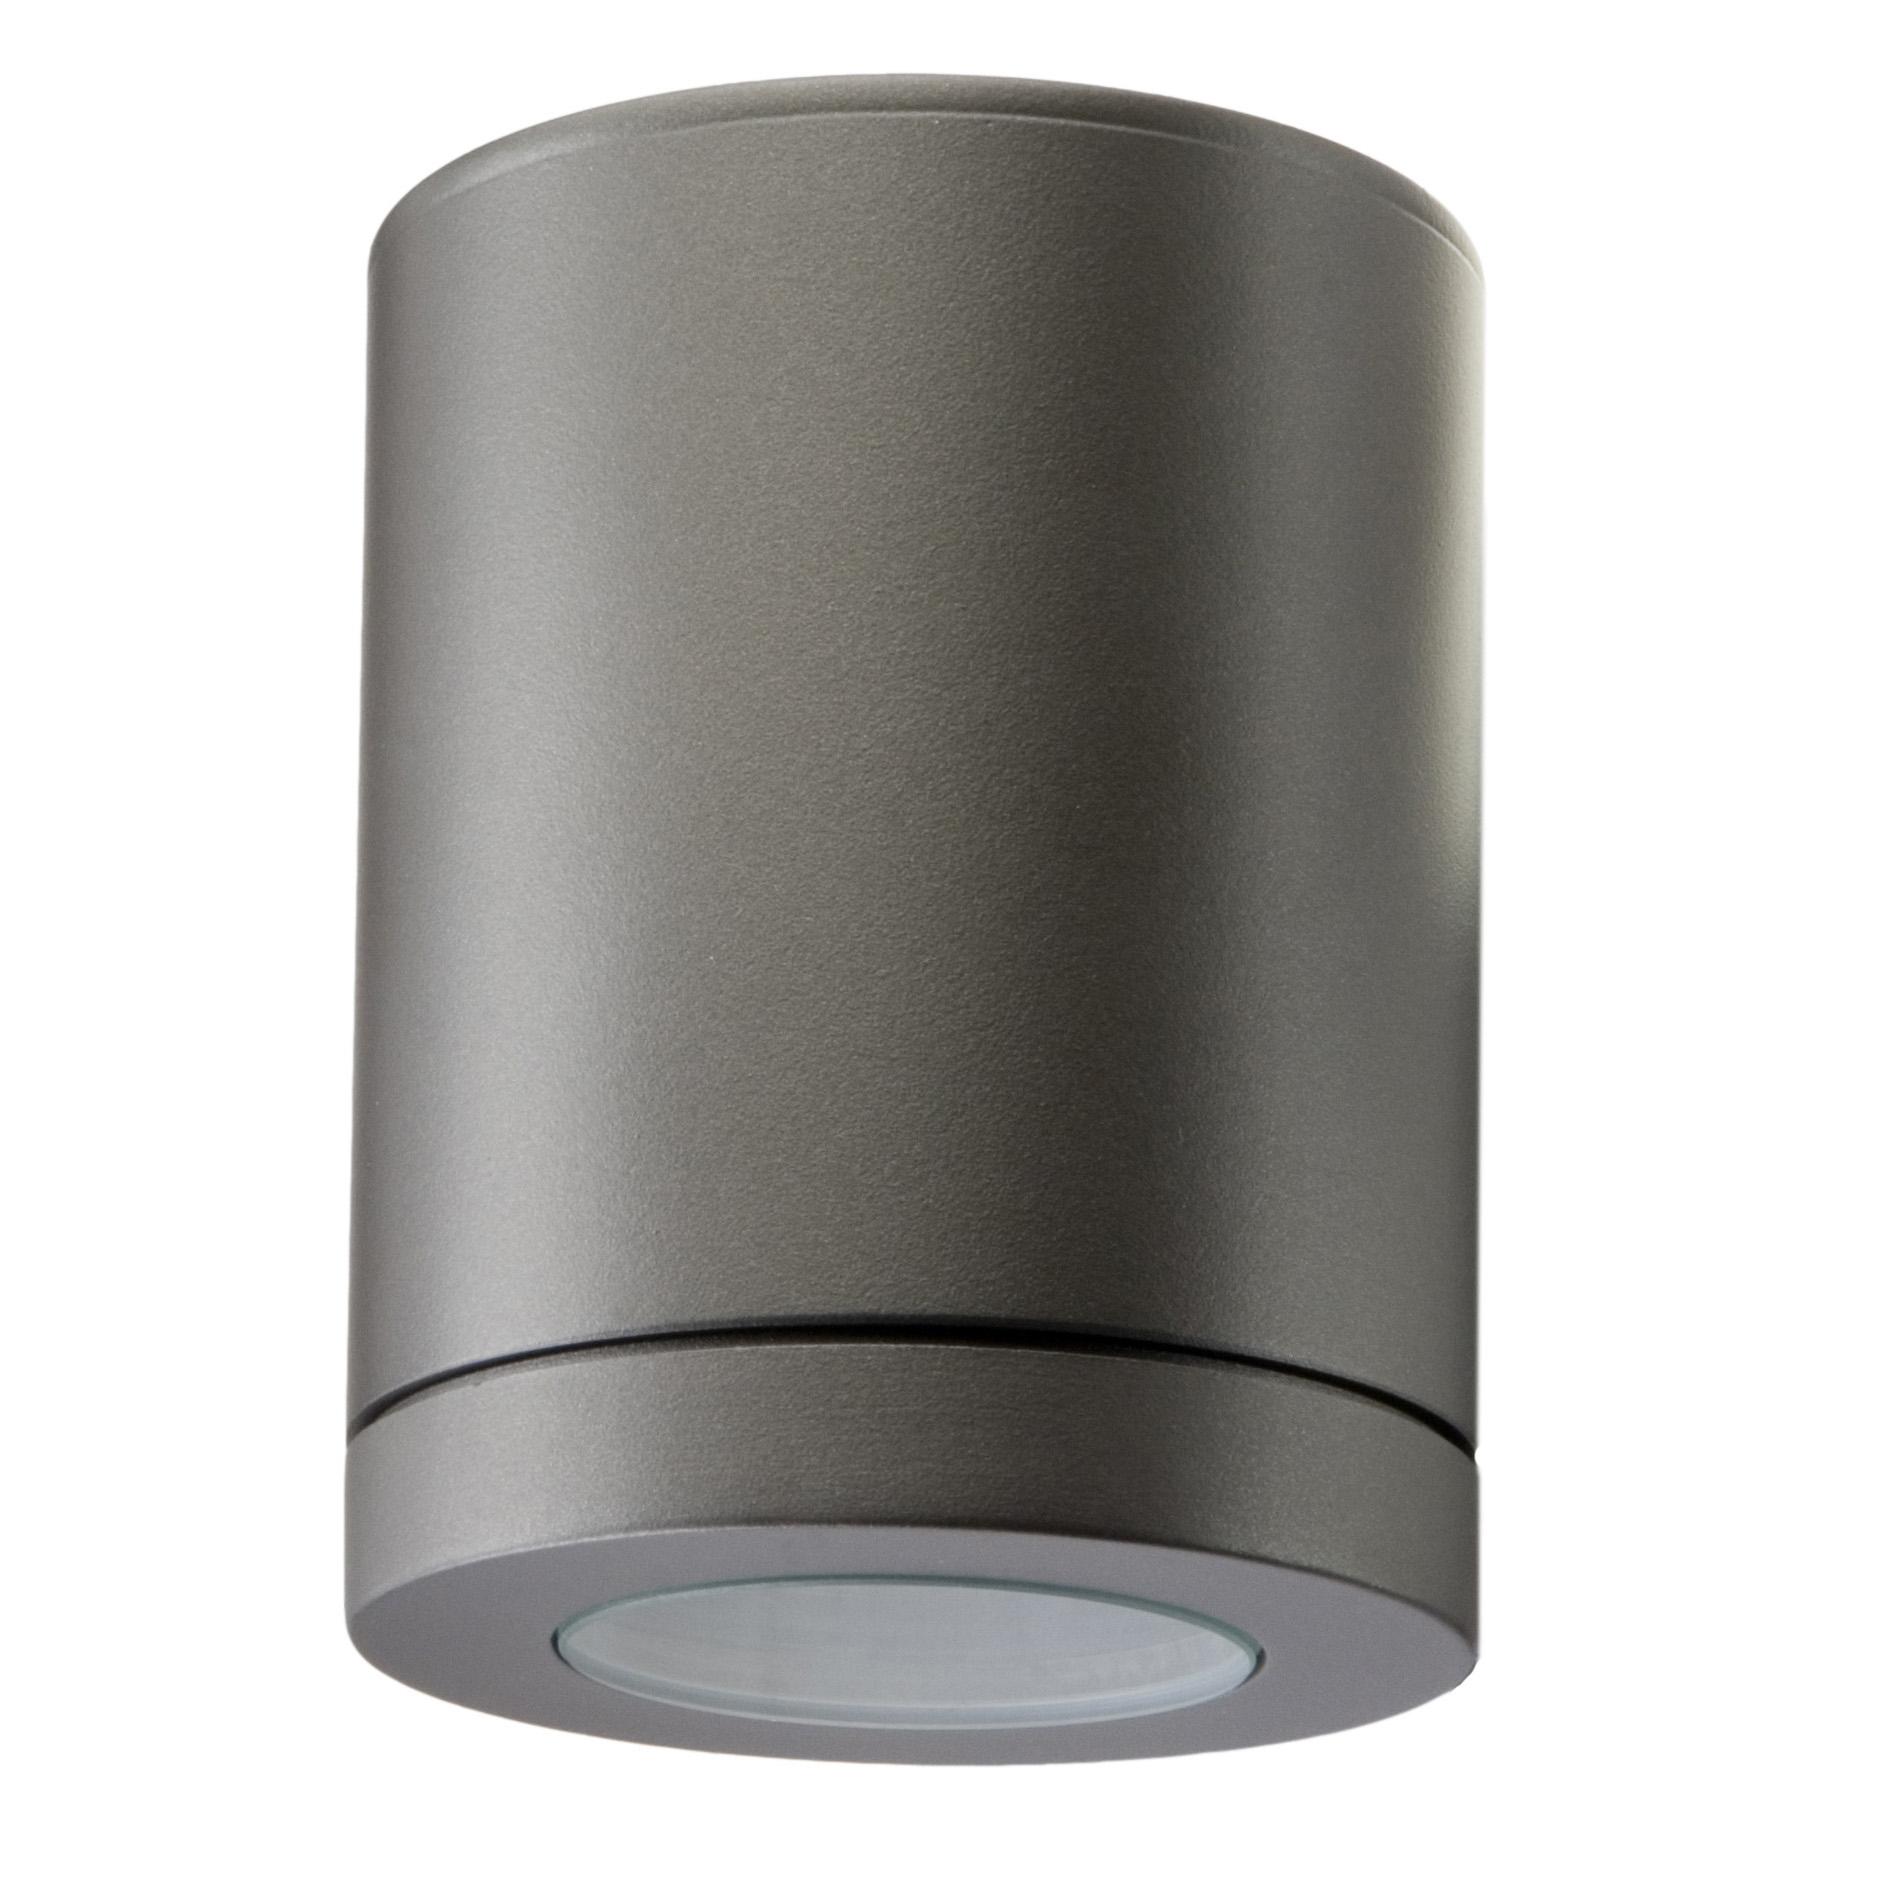 SG lighting LED Metro 35W grafiet 623695 plafond